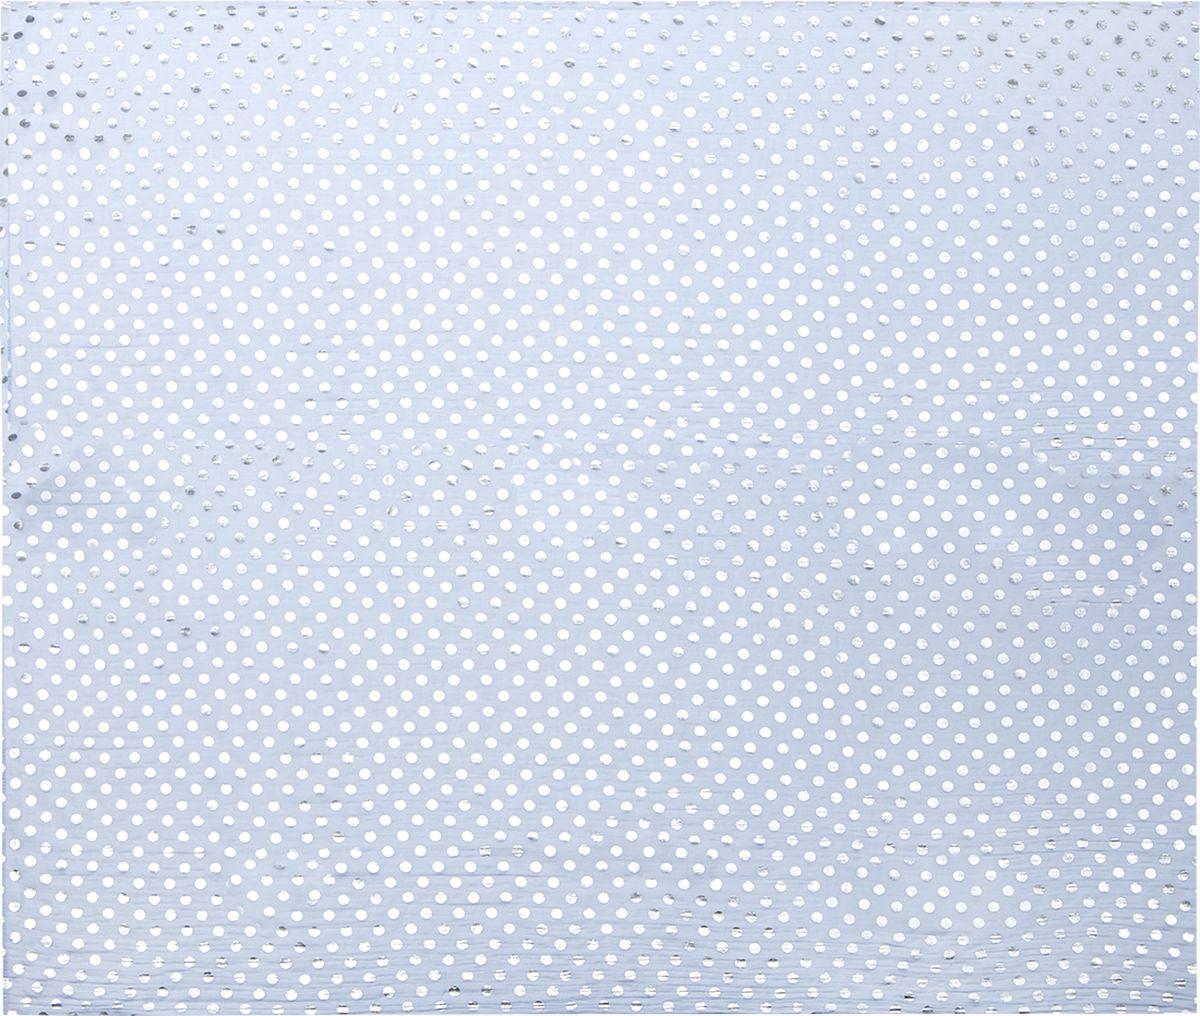 ПалантинLFA11-545Палантин торговой марки LABBRA. Состав: 100% модал. Тип подгибки: машинная подгибка, реснички. Размер: 100х180 см.